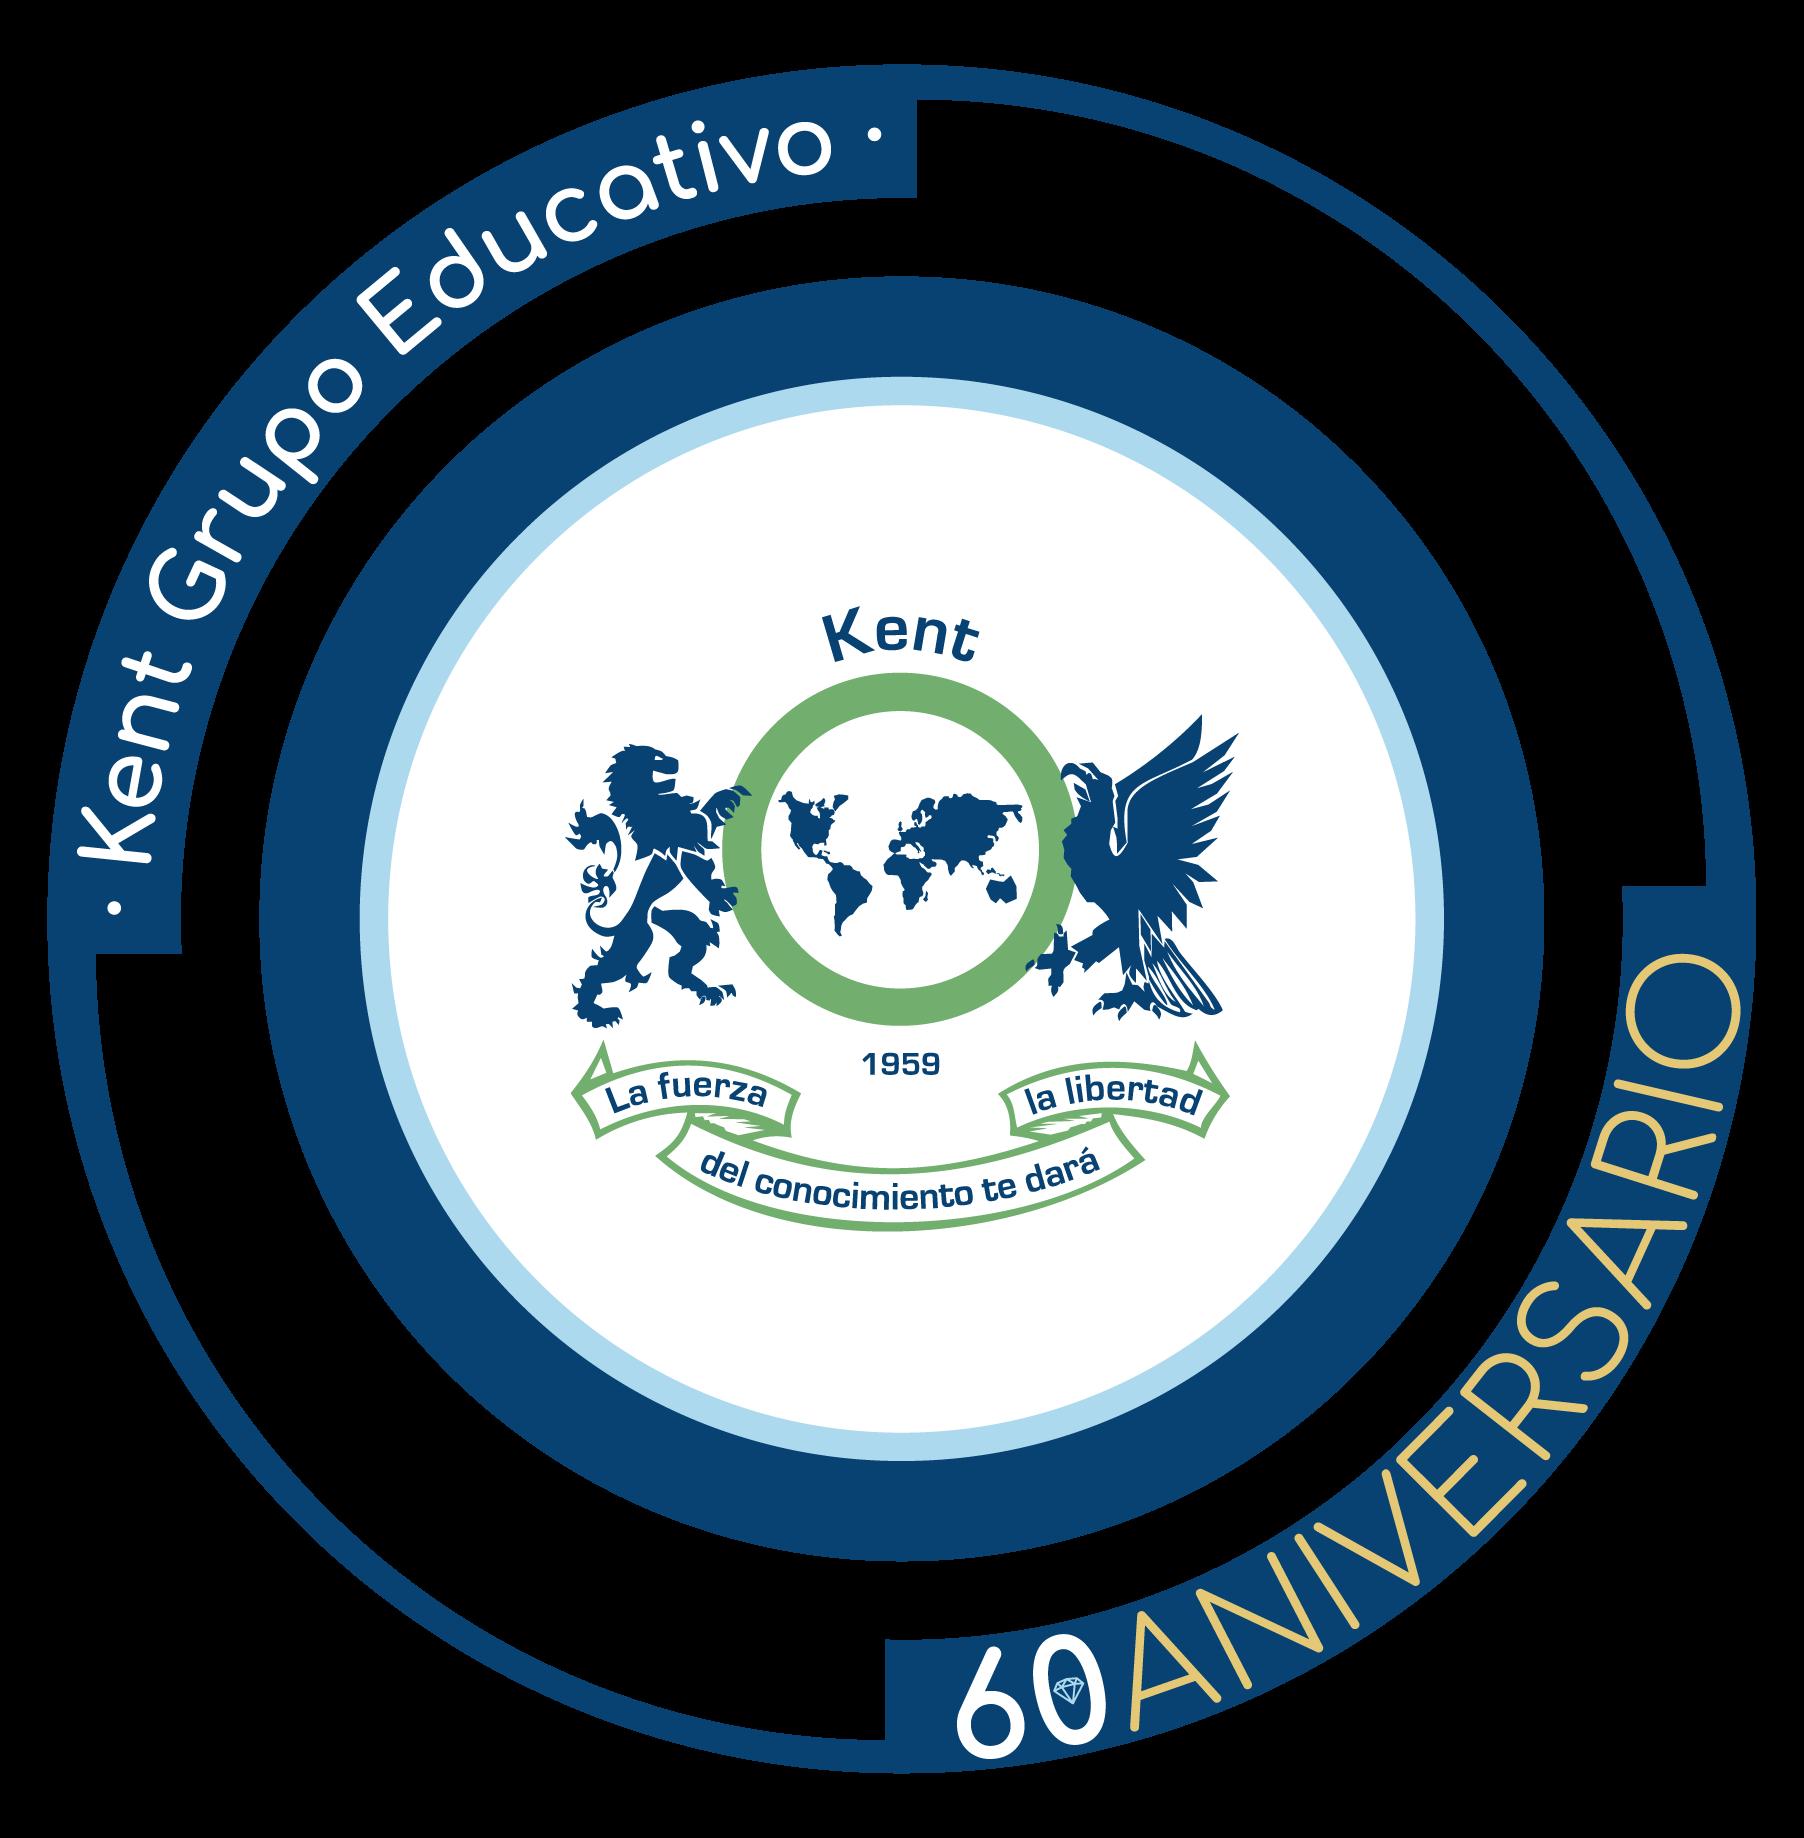 Grupo Educativo Kent – Primaria y Secundaria Bilingue